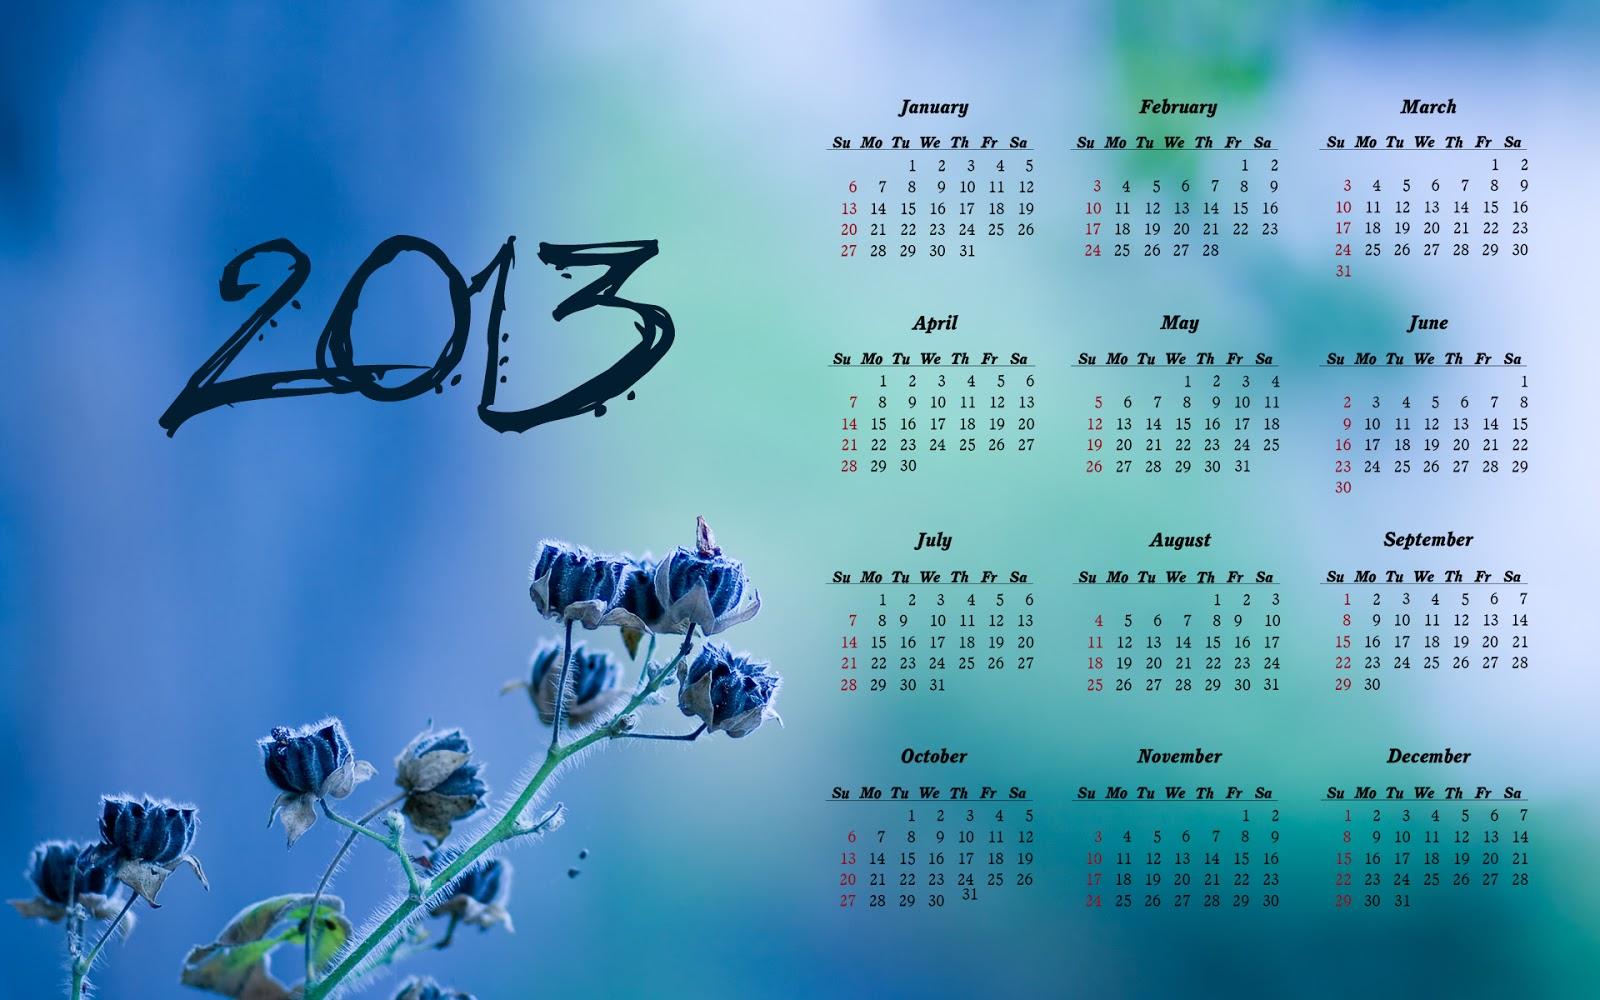 New Year Calendar 2013 Calendar 2013 2013 Calendar Desktop 1600x1000